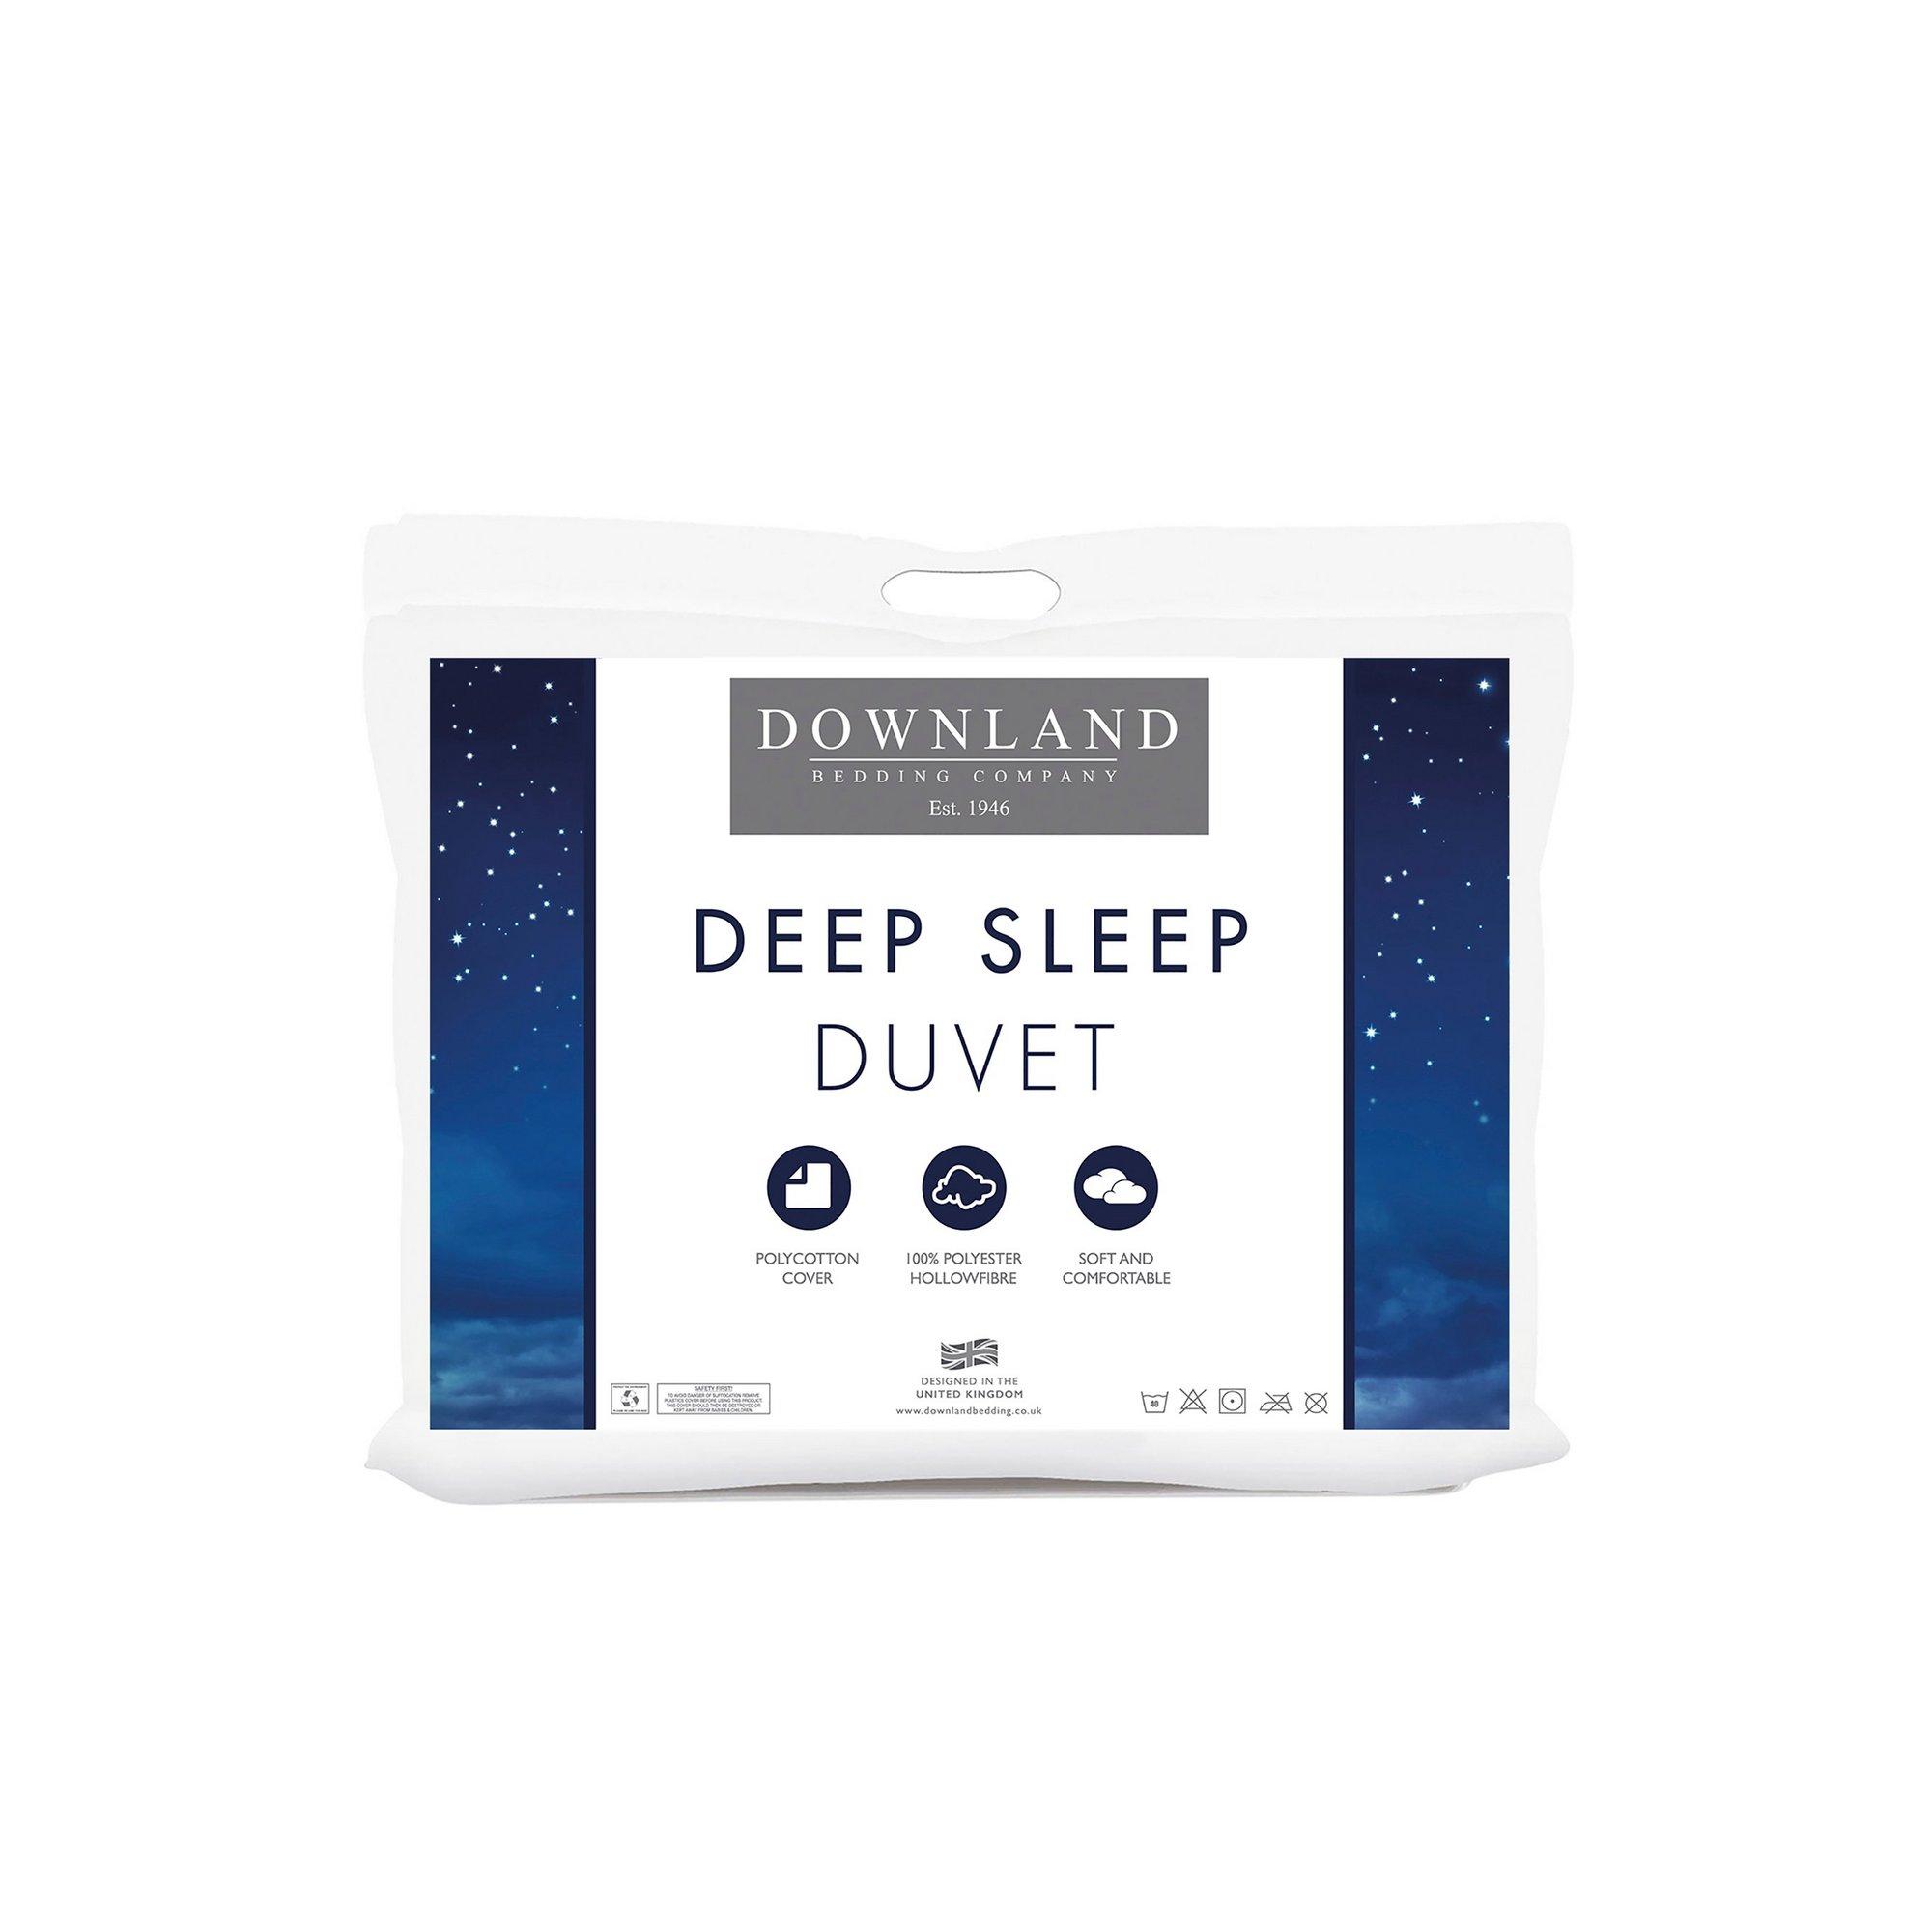 Image of Downland Deep Sleep 10.5 Tog Duvet